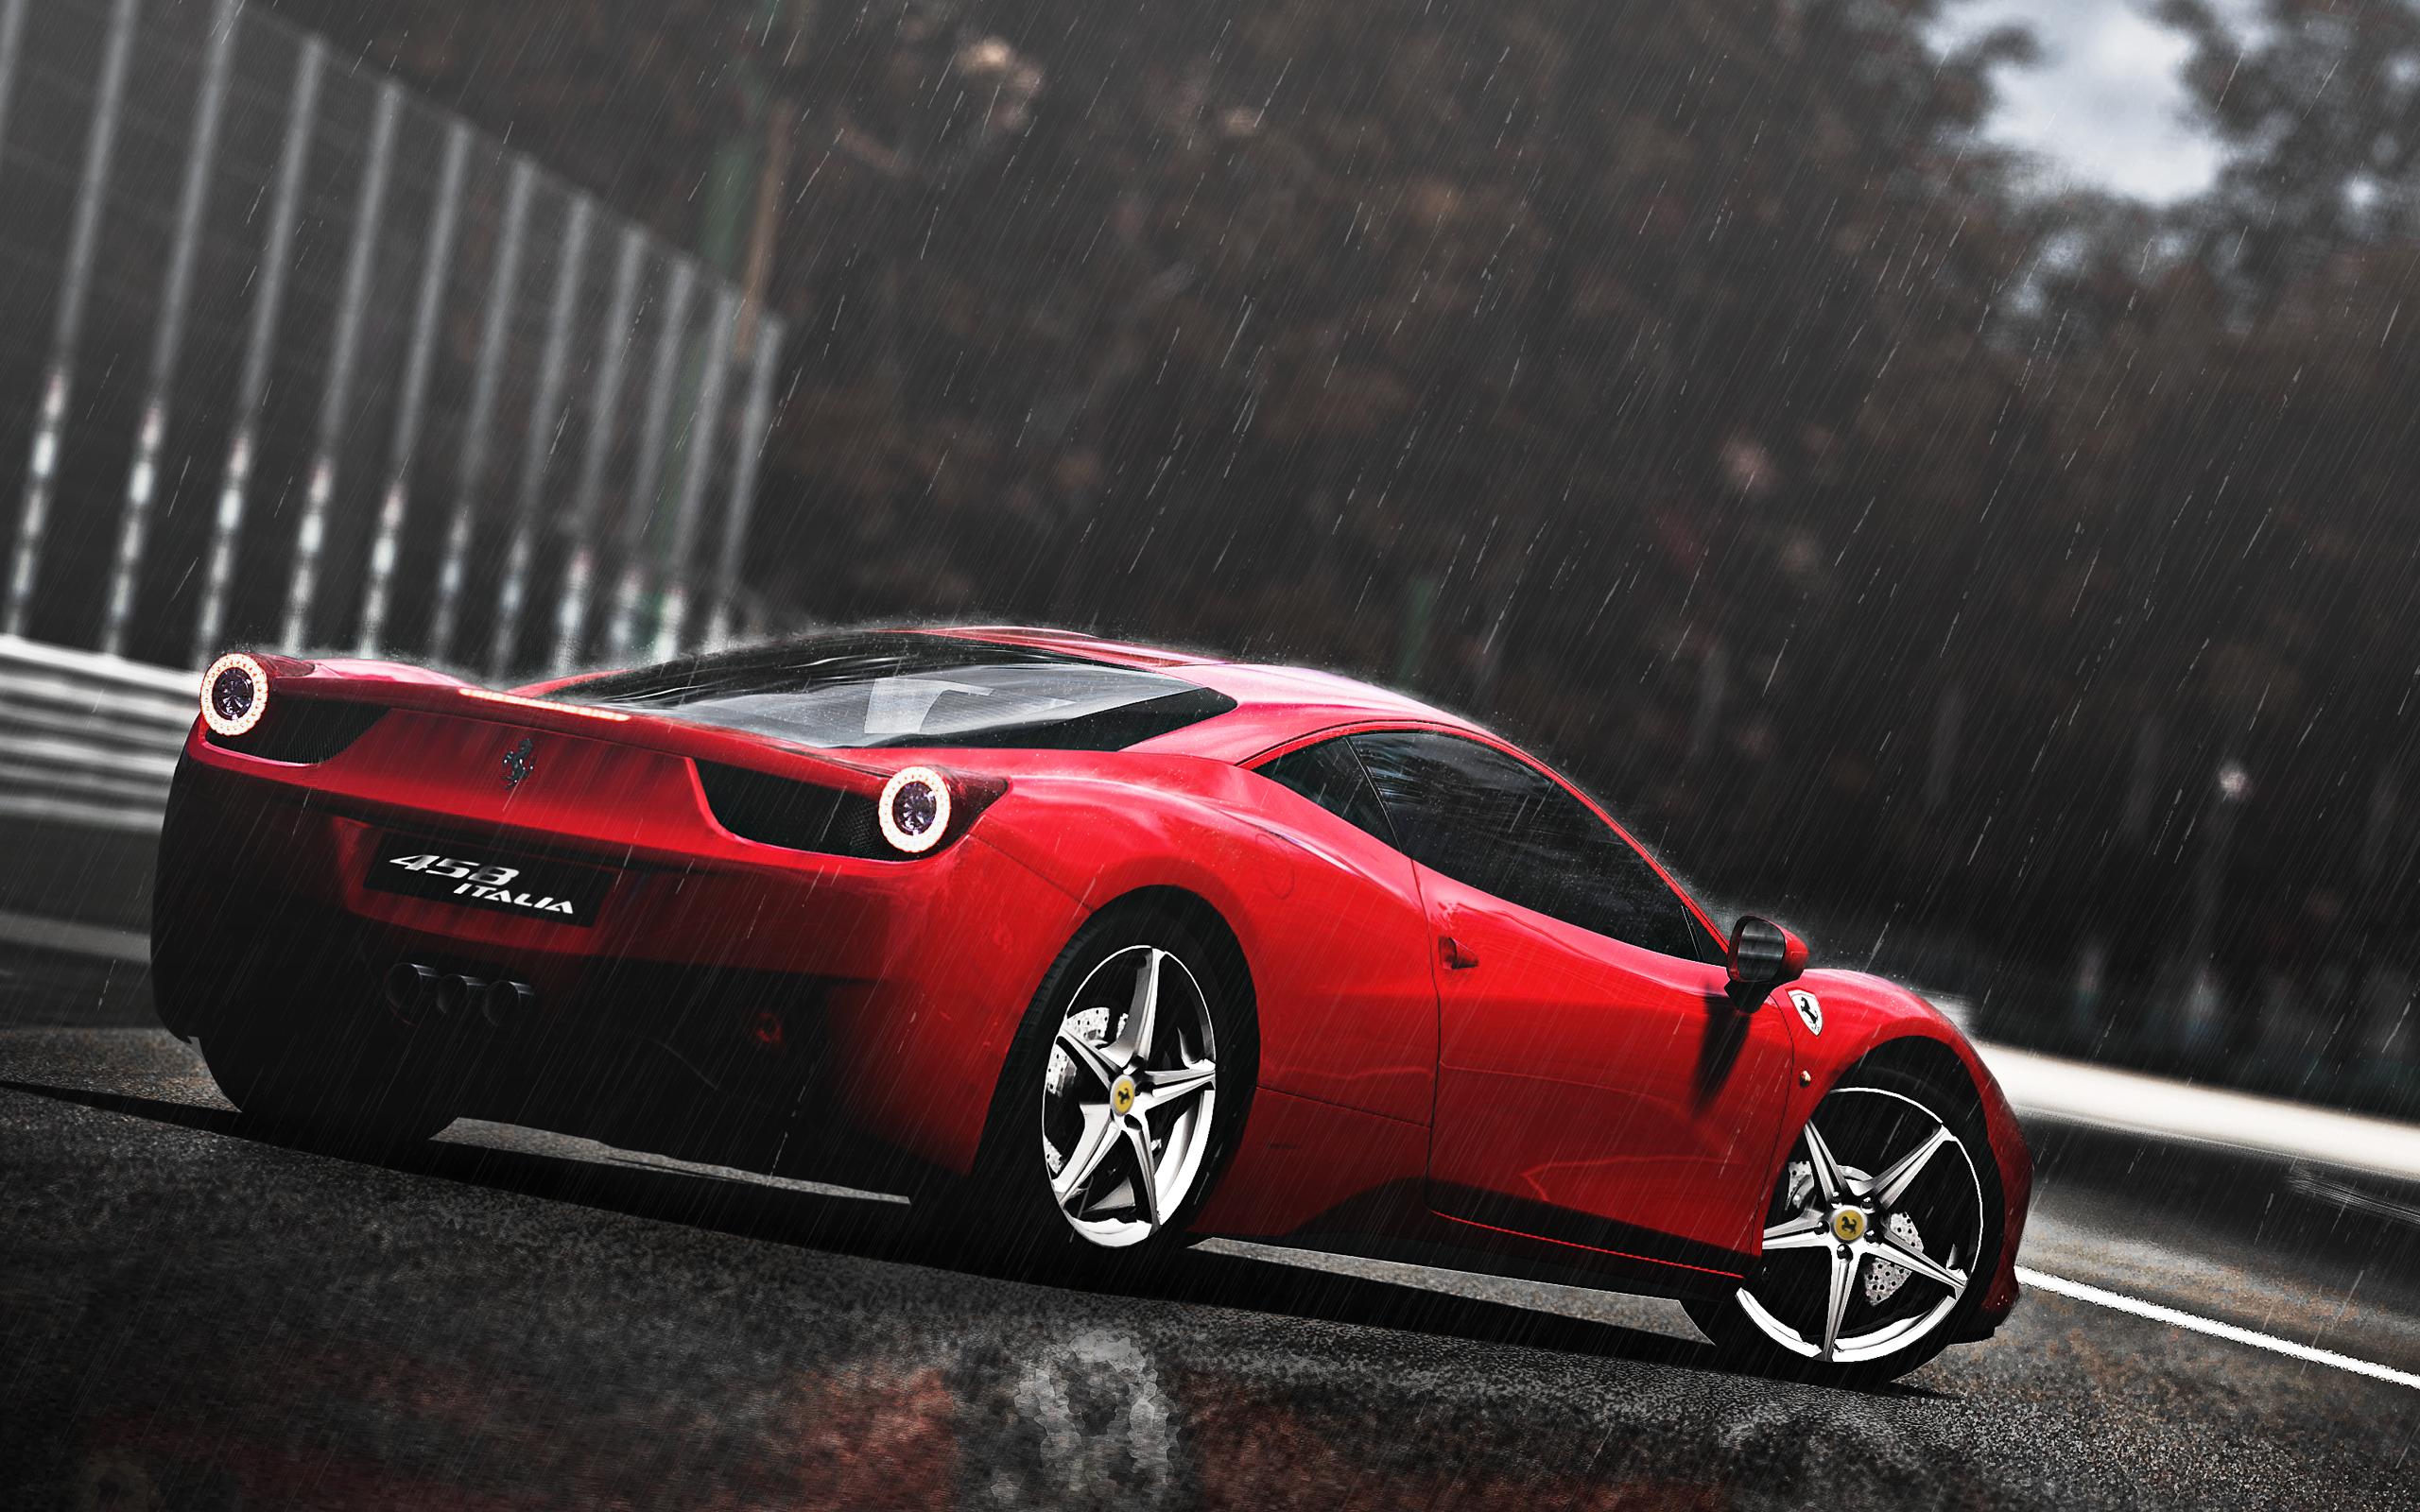 Ferrari 458 Italia Rain CG Gt Gran Turismo Supercars Rain Drops Storm Track  Red Wallpaper | 2560x1600 | 31607 | WallpaperUP